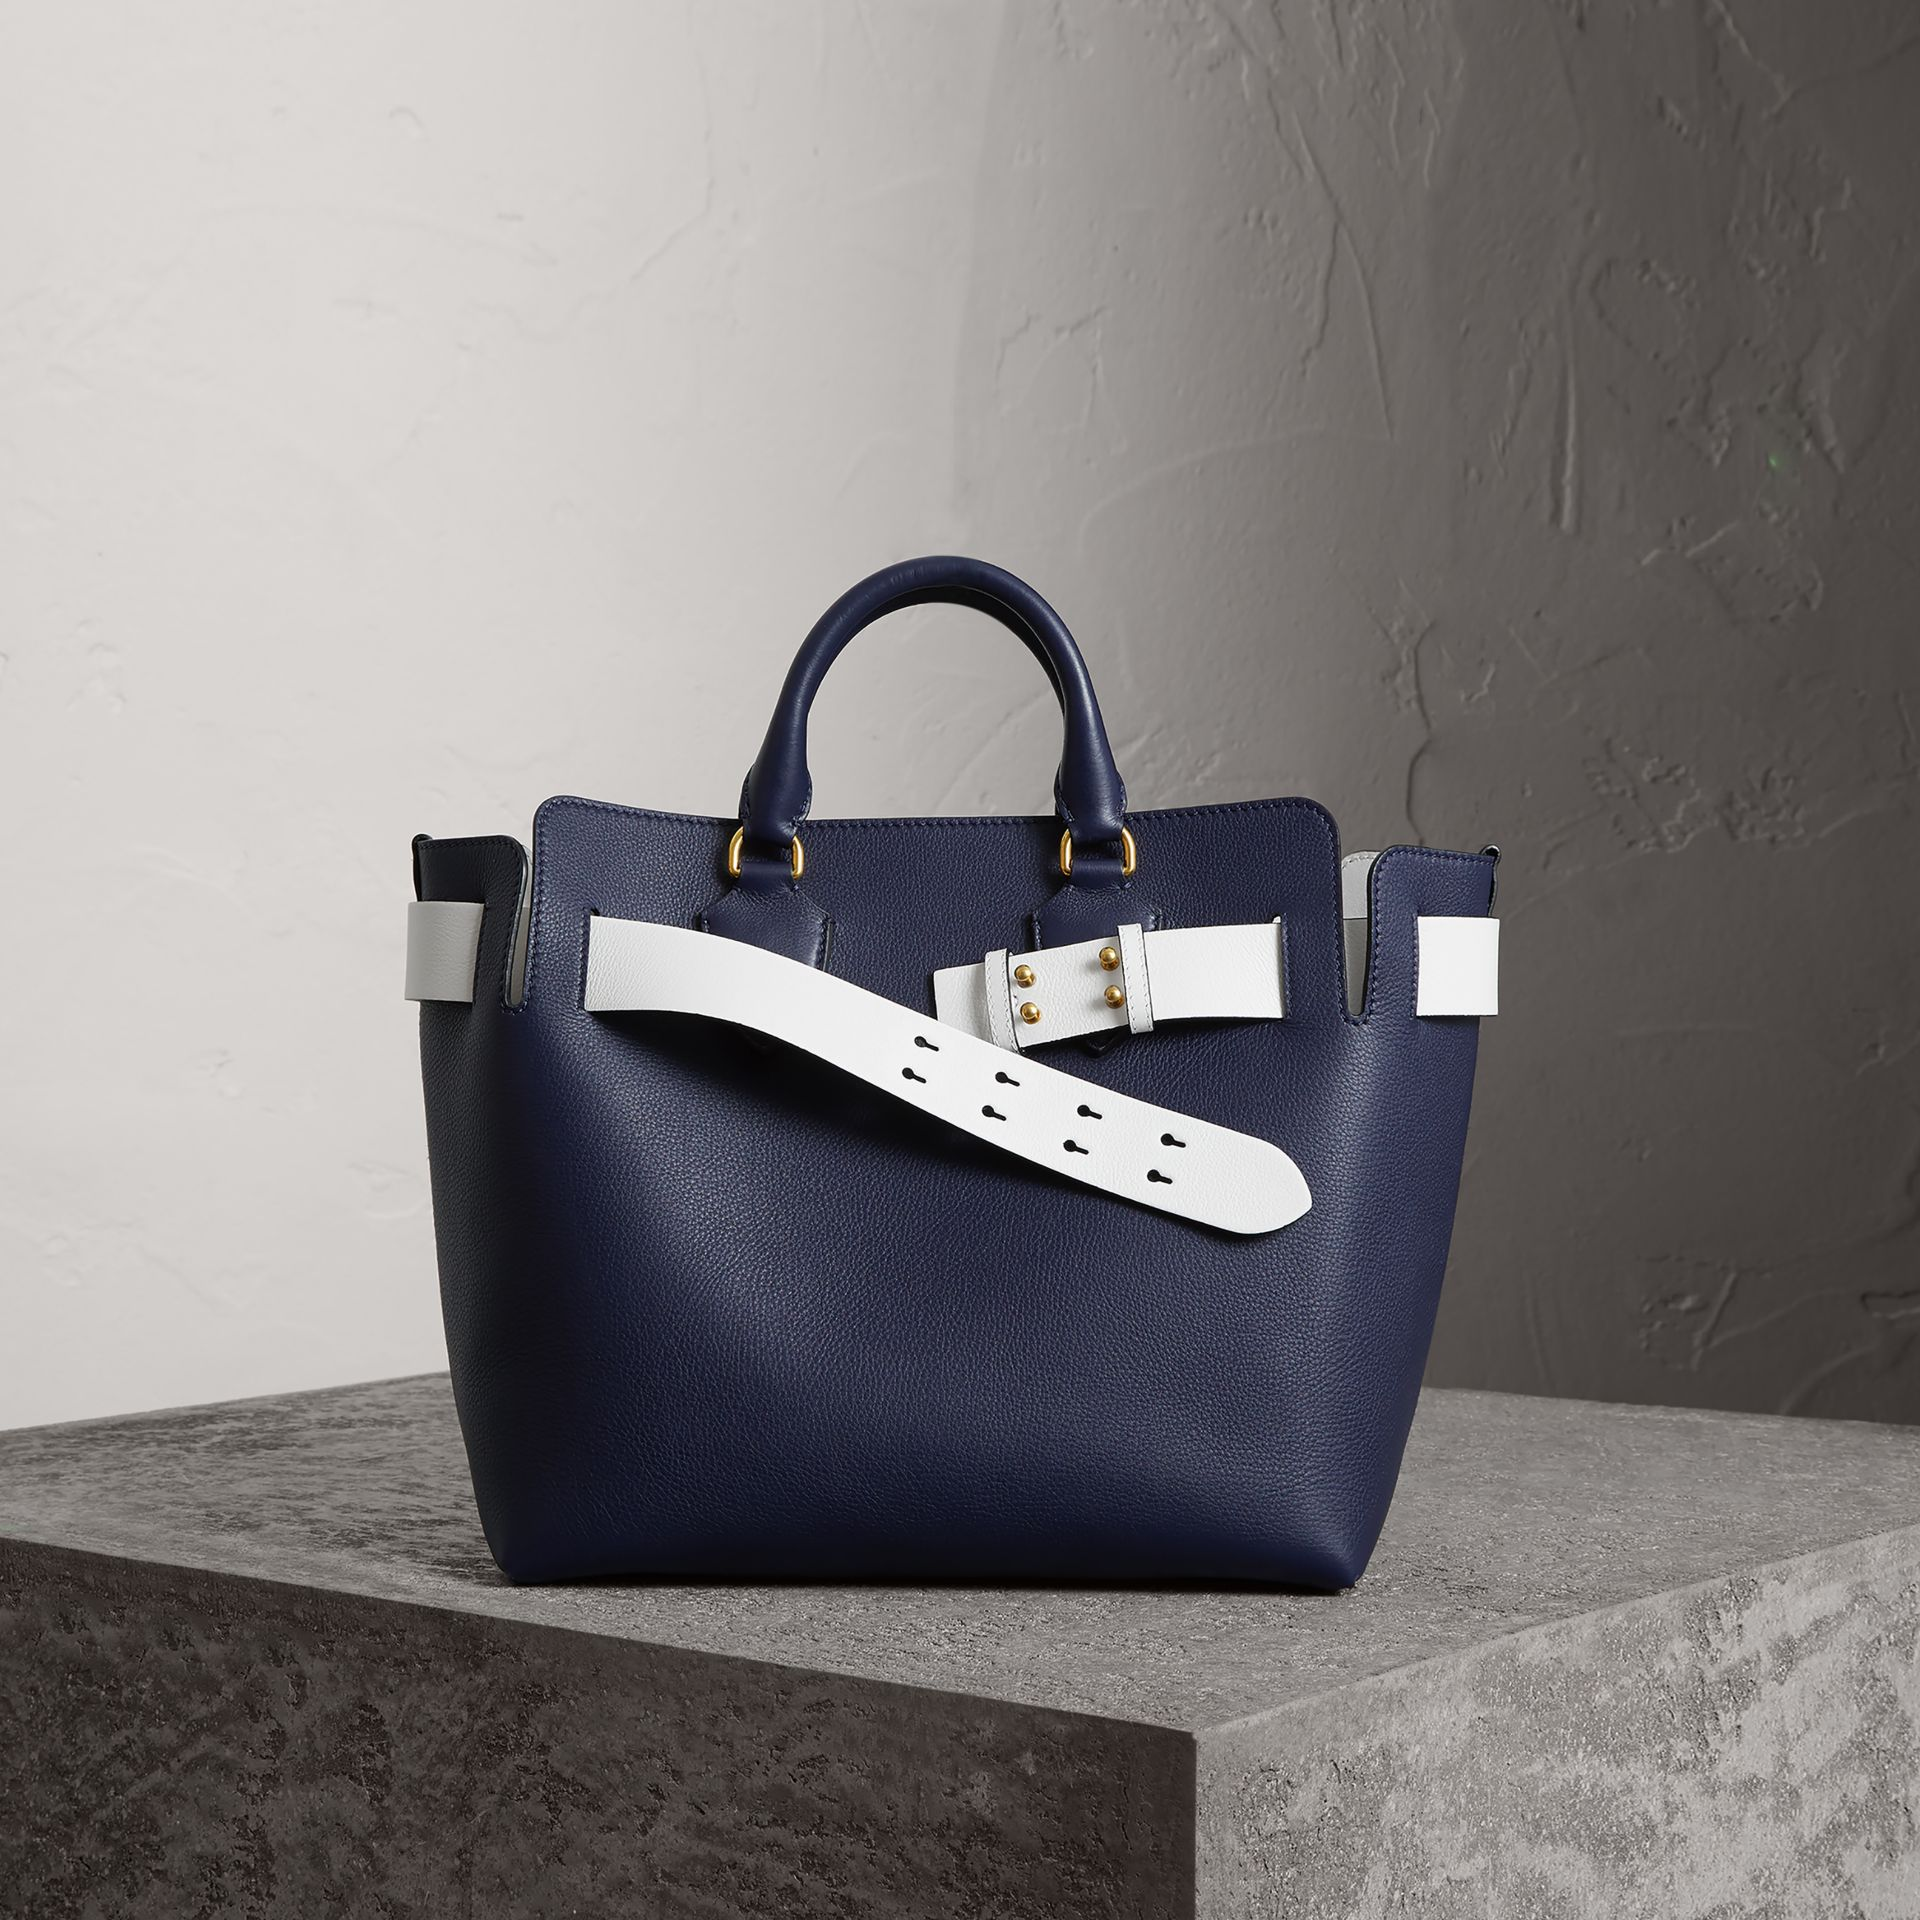 Burberry The Medium Leather Belt Bag In Blue   ModeSens b0ce54fd51